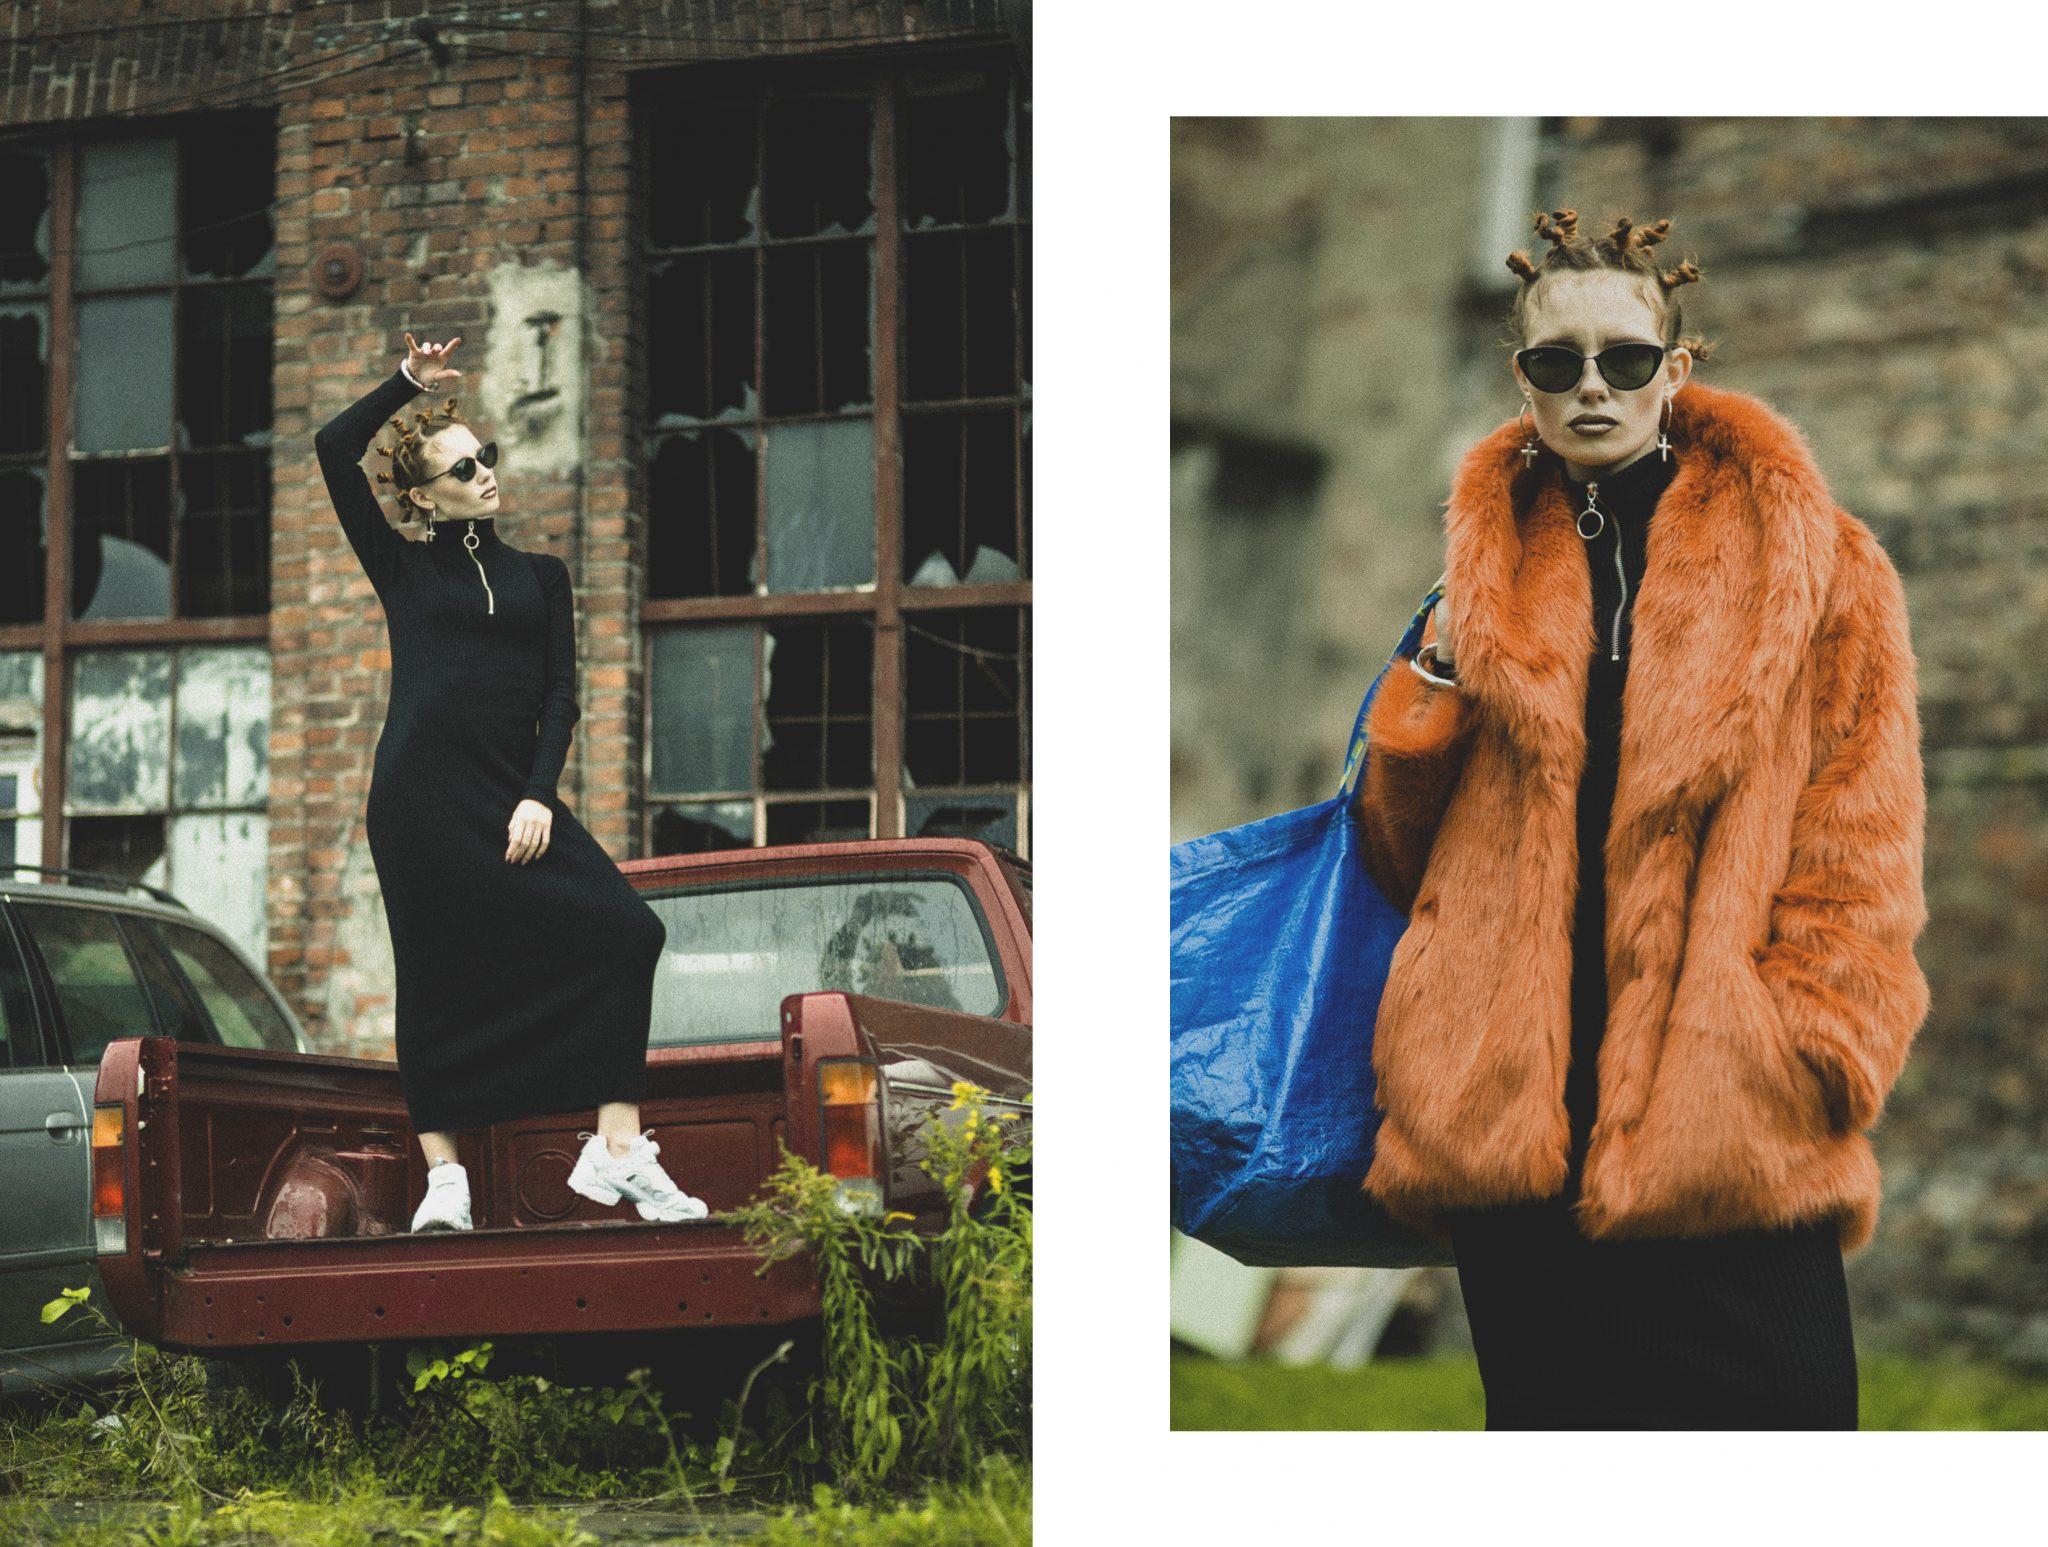 red or blue pill ? matrix fashion story le dernier etage magazine editorial webditorial magazine Karolina Orzechowska photography